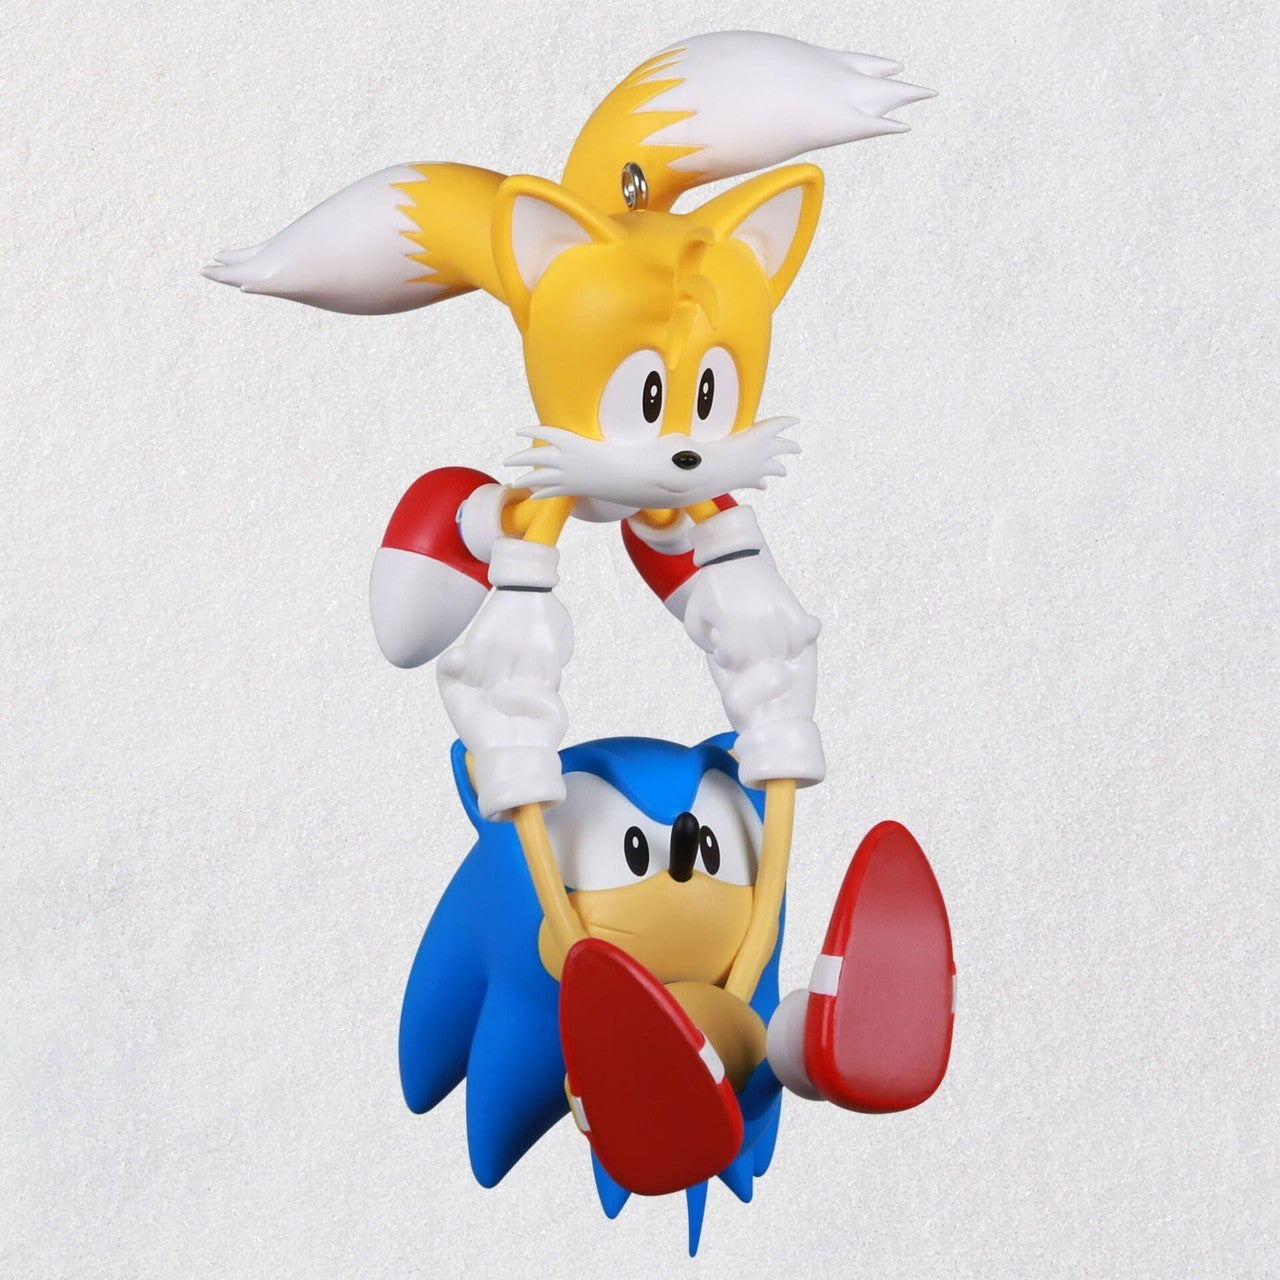 Sonic-the-Hedgehog-Sonic-&-Tails-Keepsake-Ornament_1999QXI7432_01